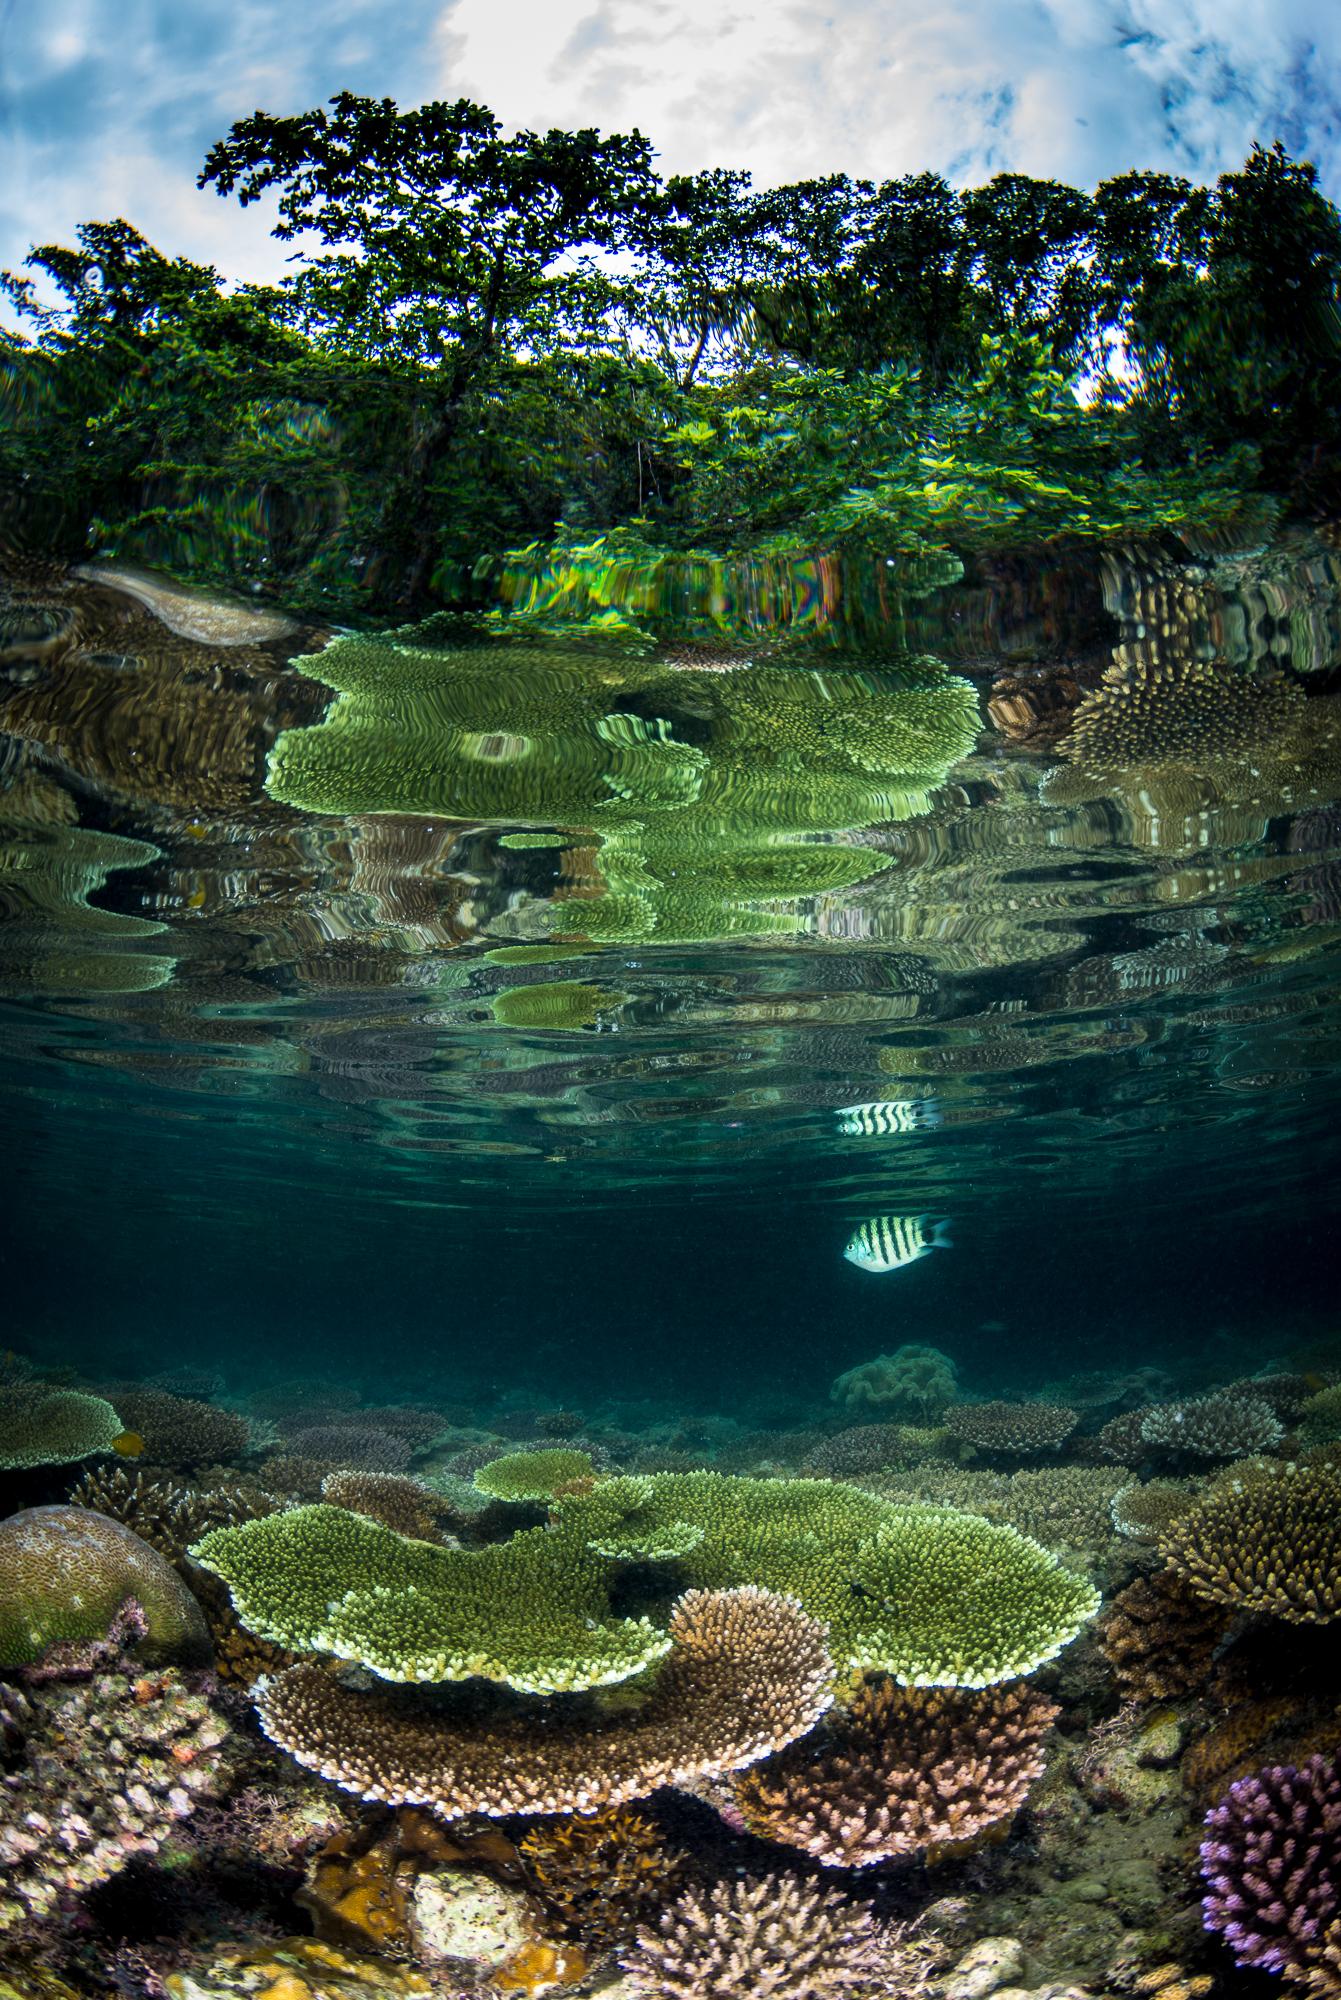 Photo: Matt Curnock/Coral Reef Image Bank